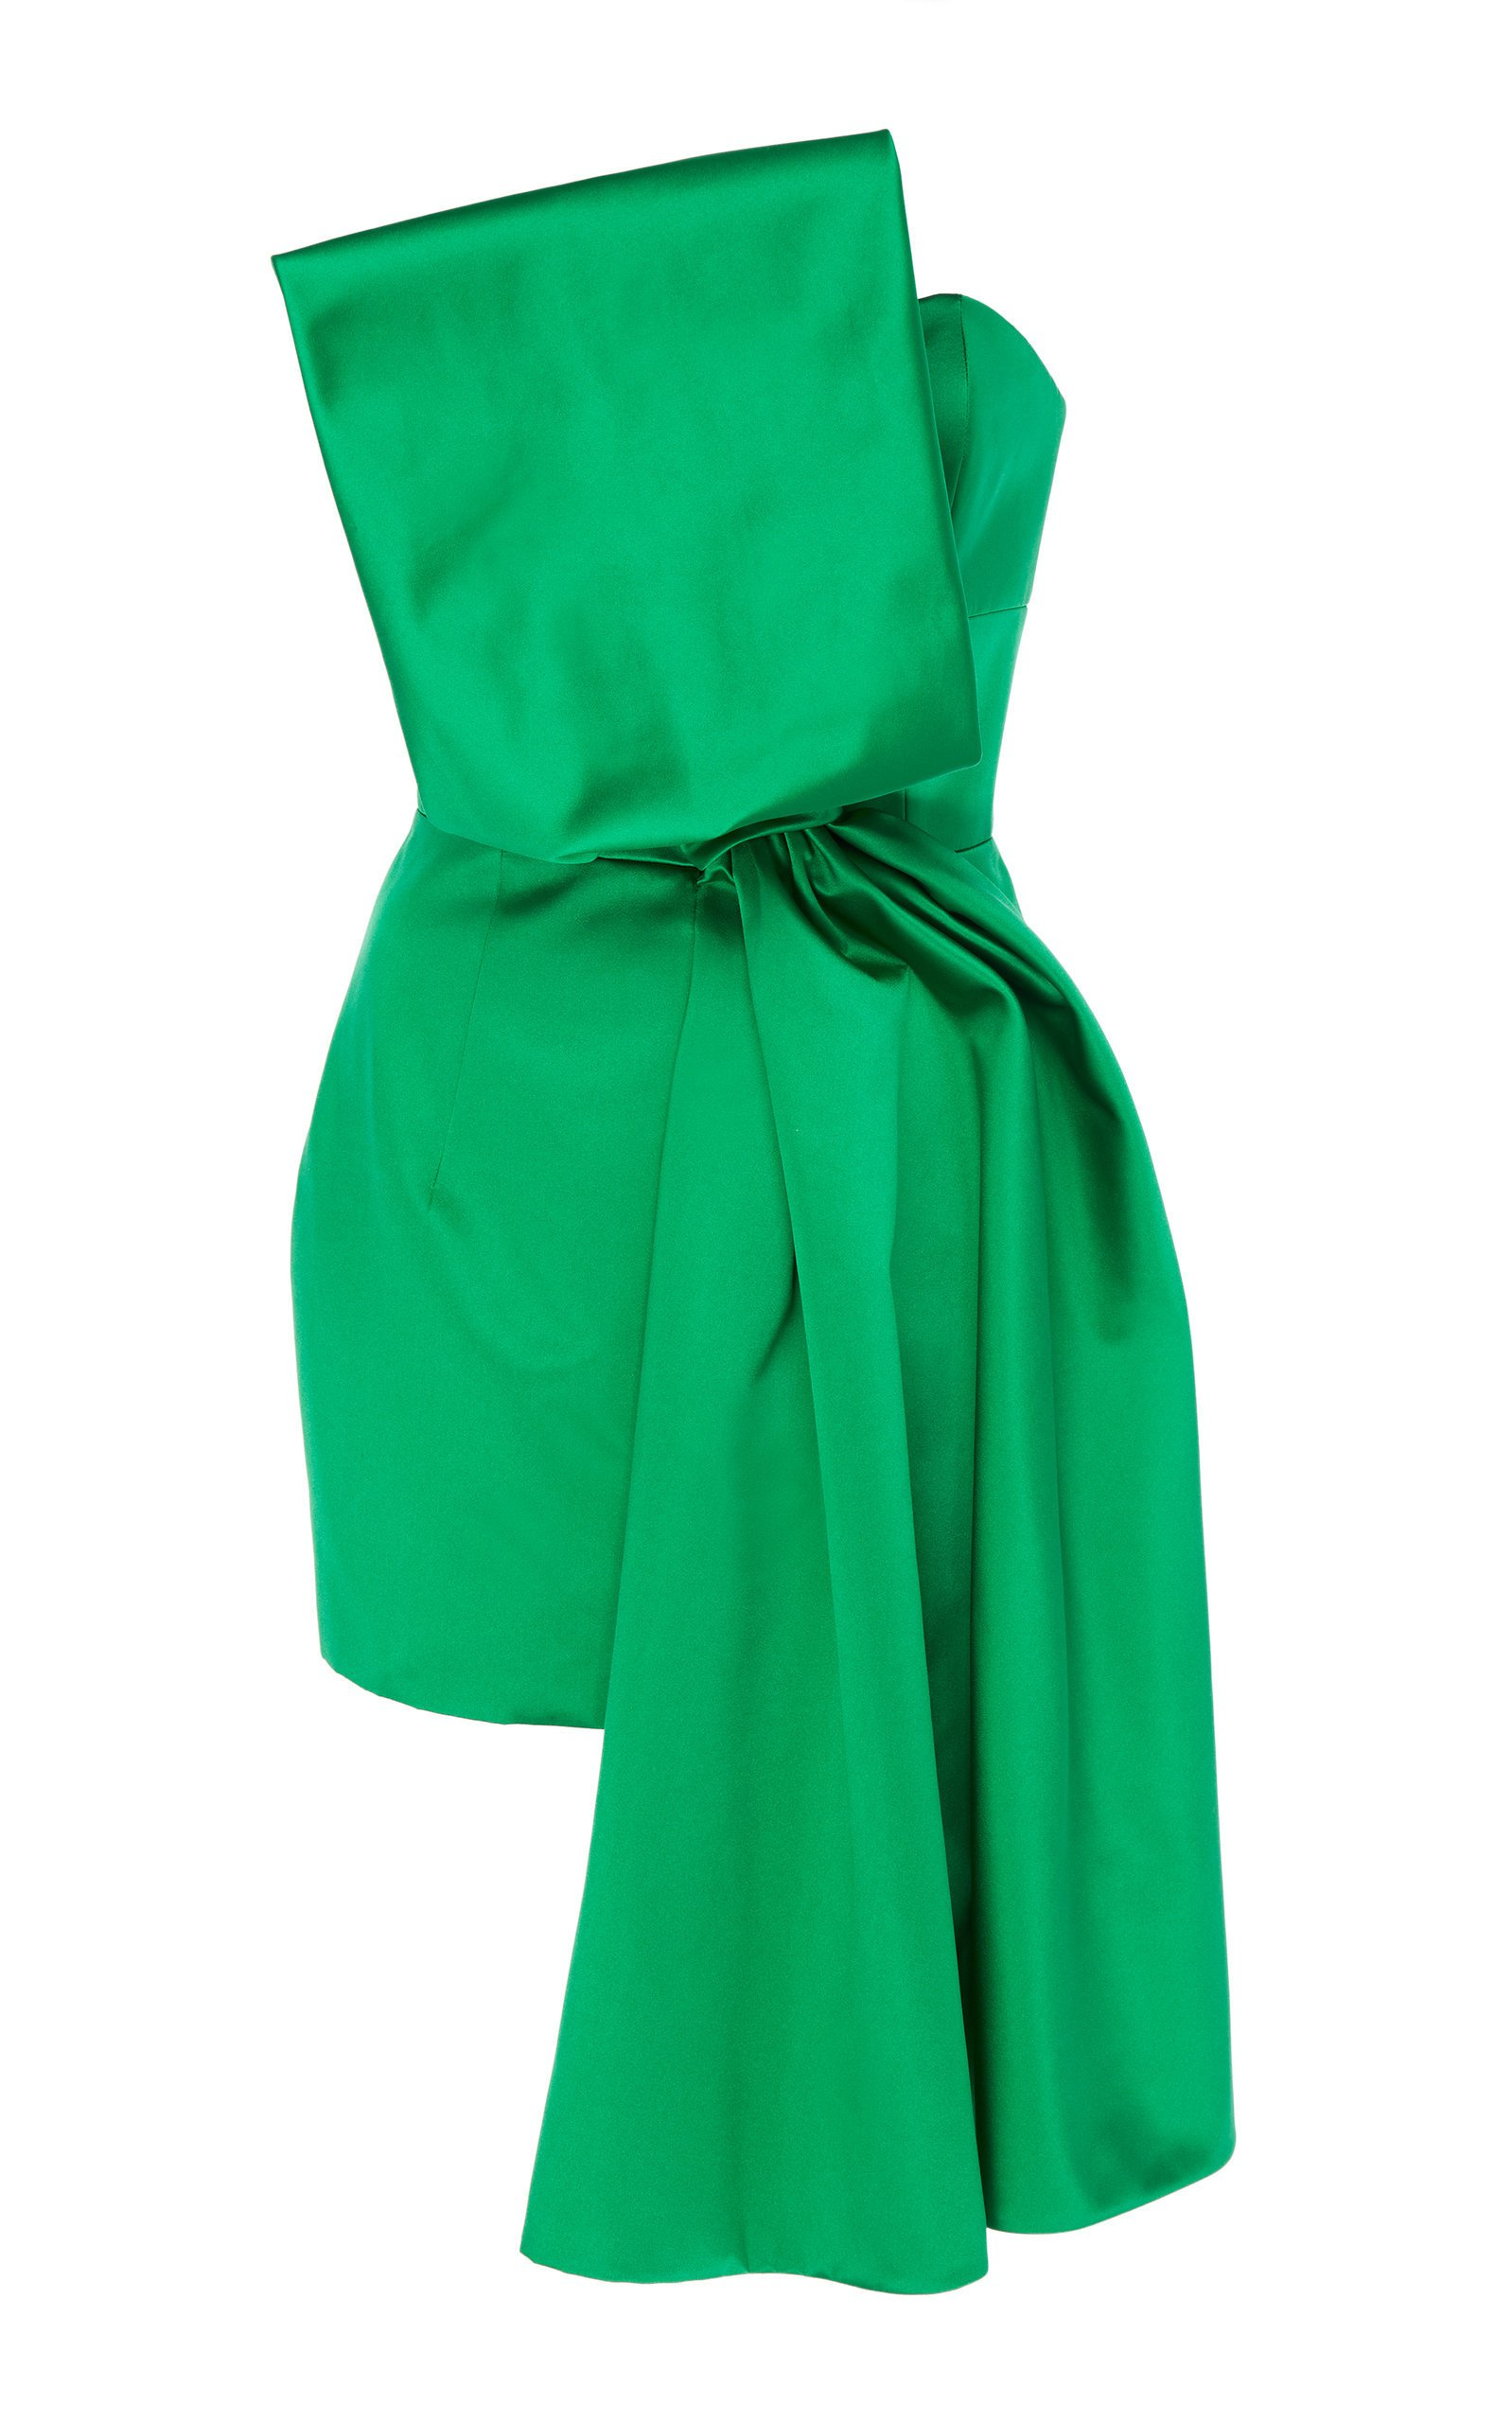 Paule Ka Bow-Detail Duchess Satin Mini Dress